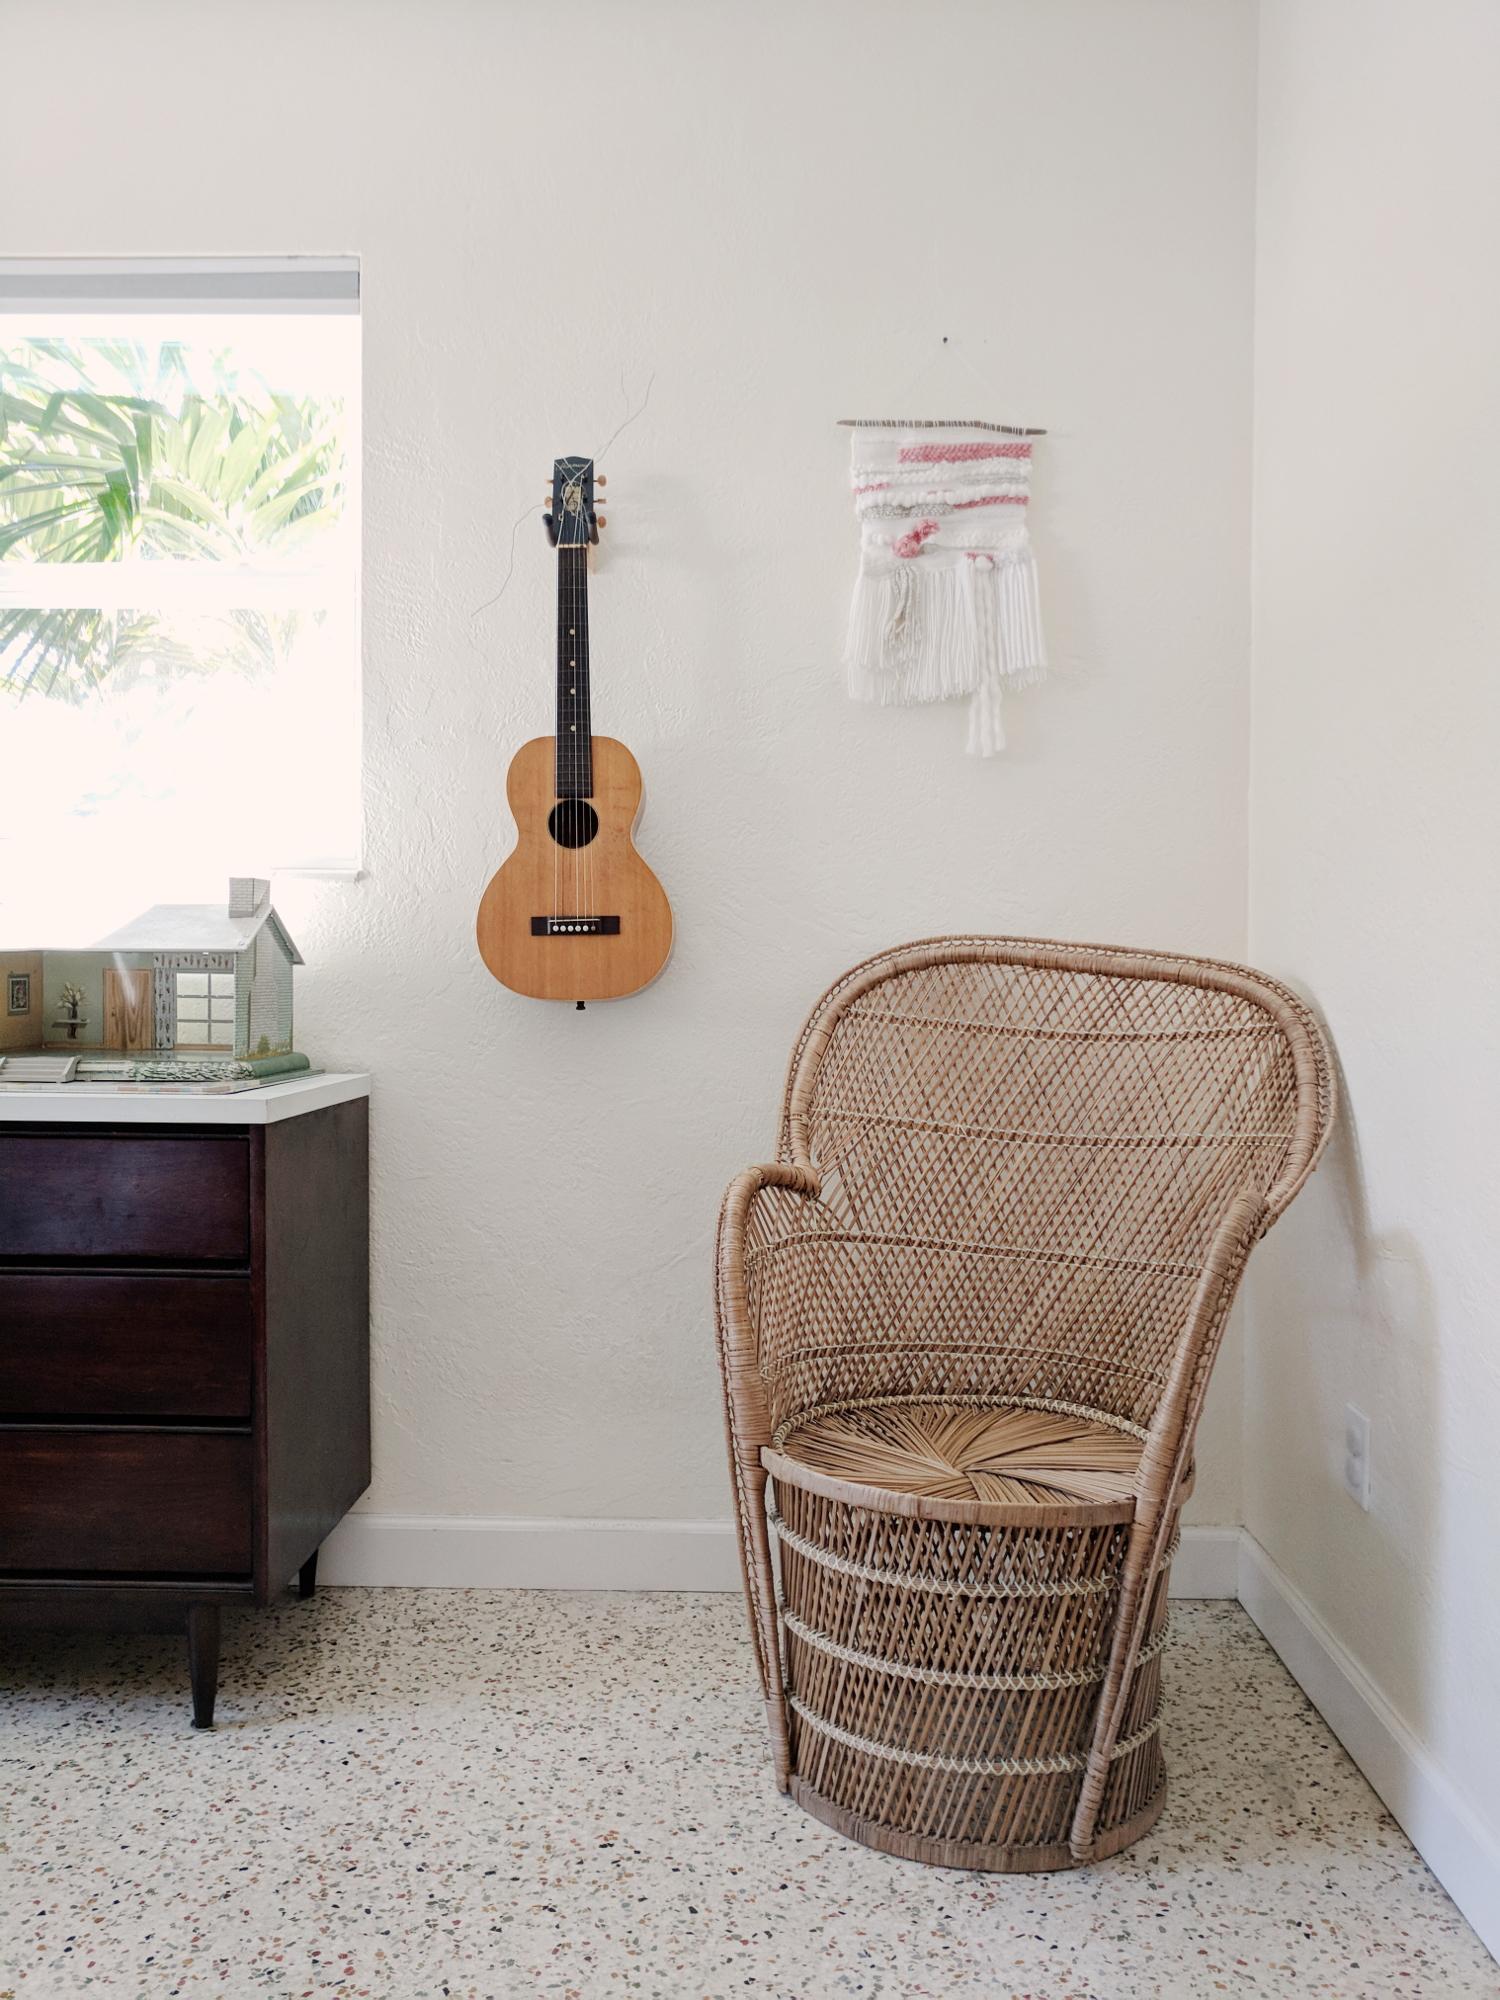 peacock chair, mid century dresser, vintage doll house, vintage guitar, wall art